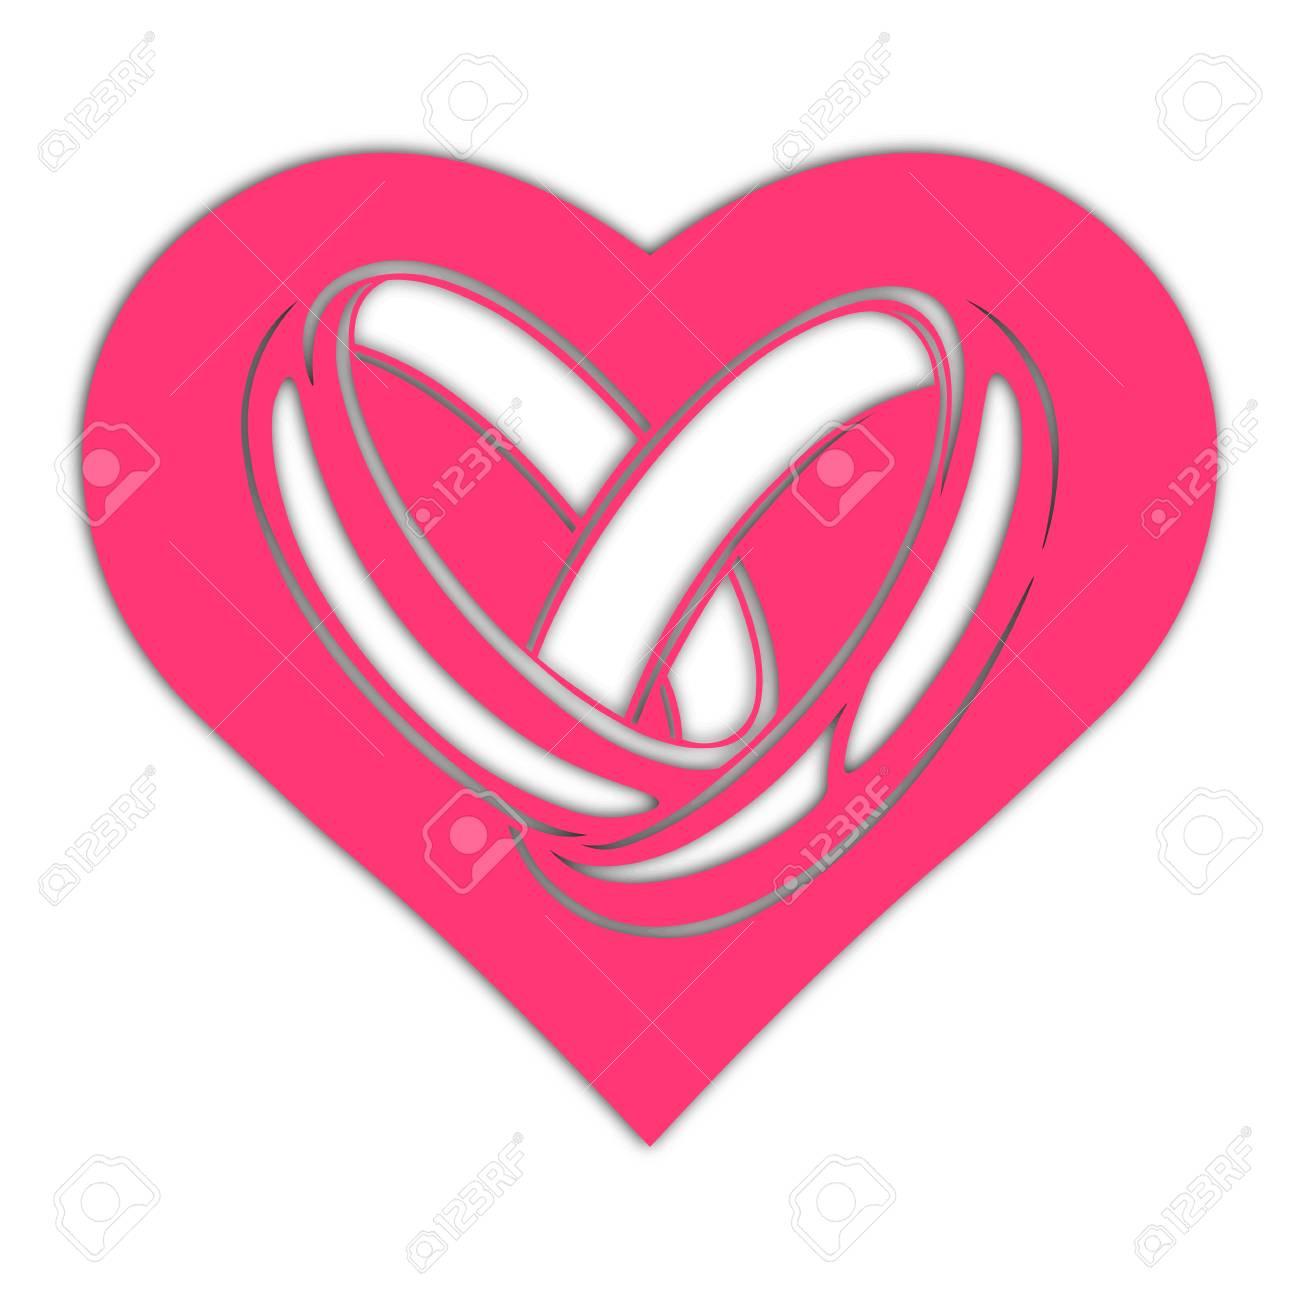 Heart Wedding Rings Choice Image - Wedding Dress, Decoration And ...